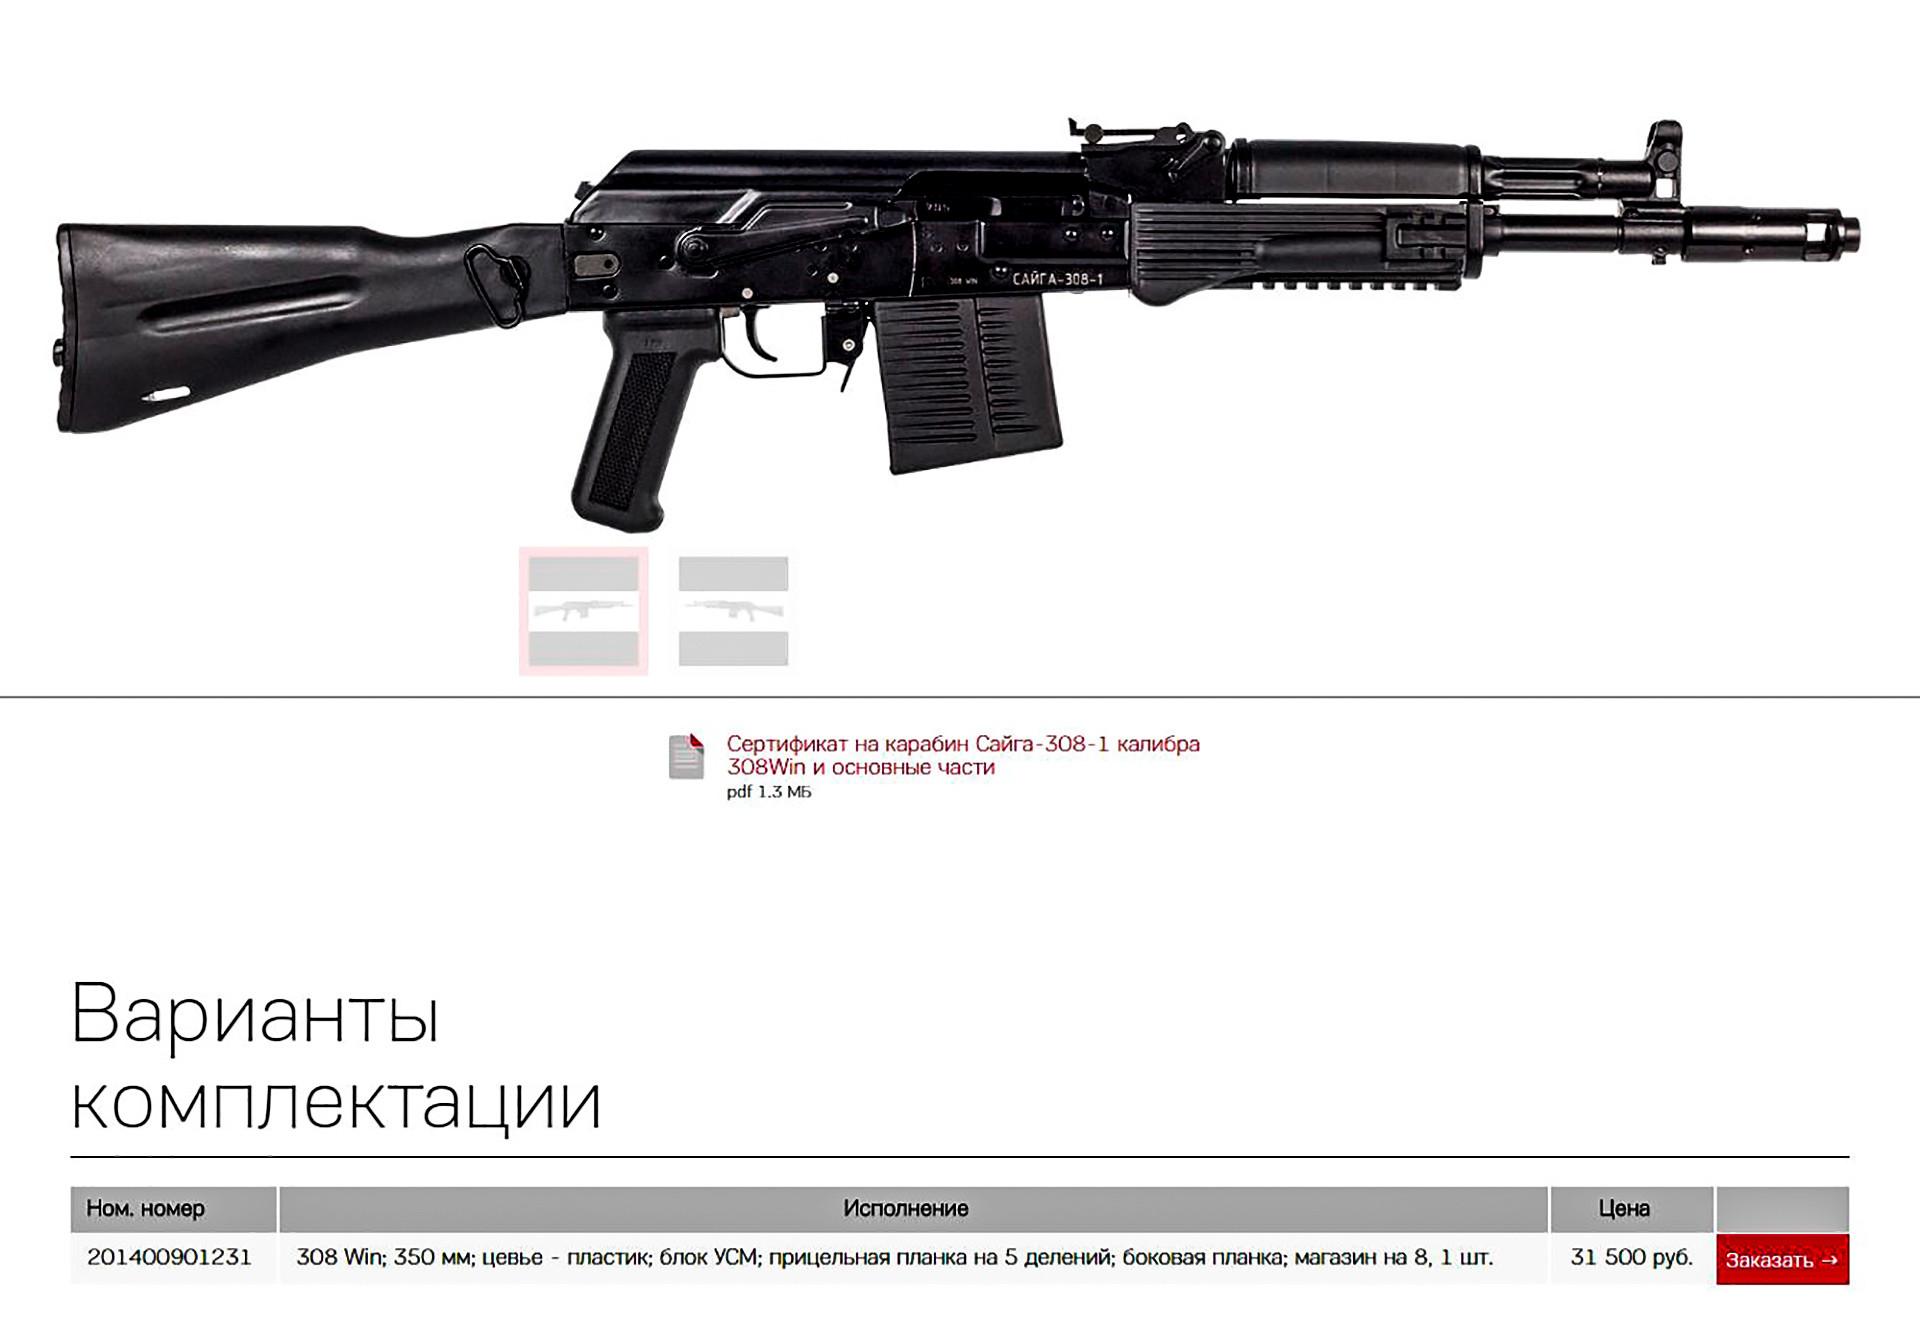 Un modello di Kalashnikov